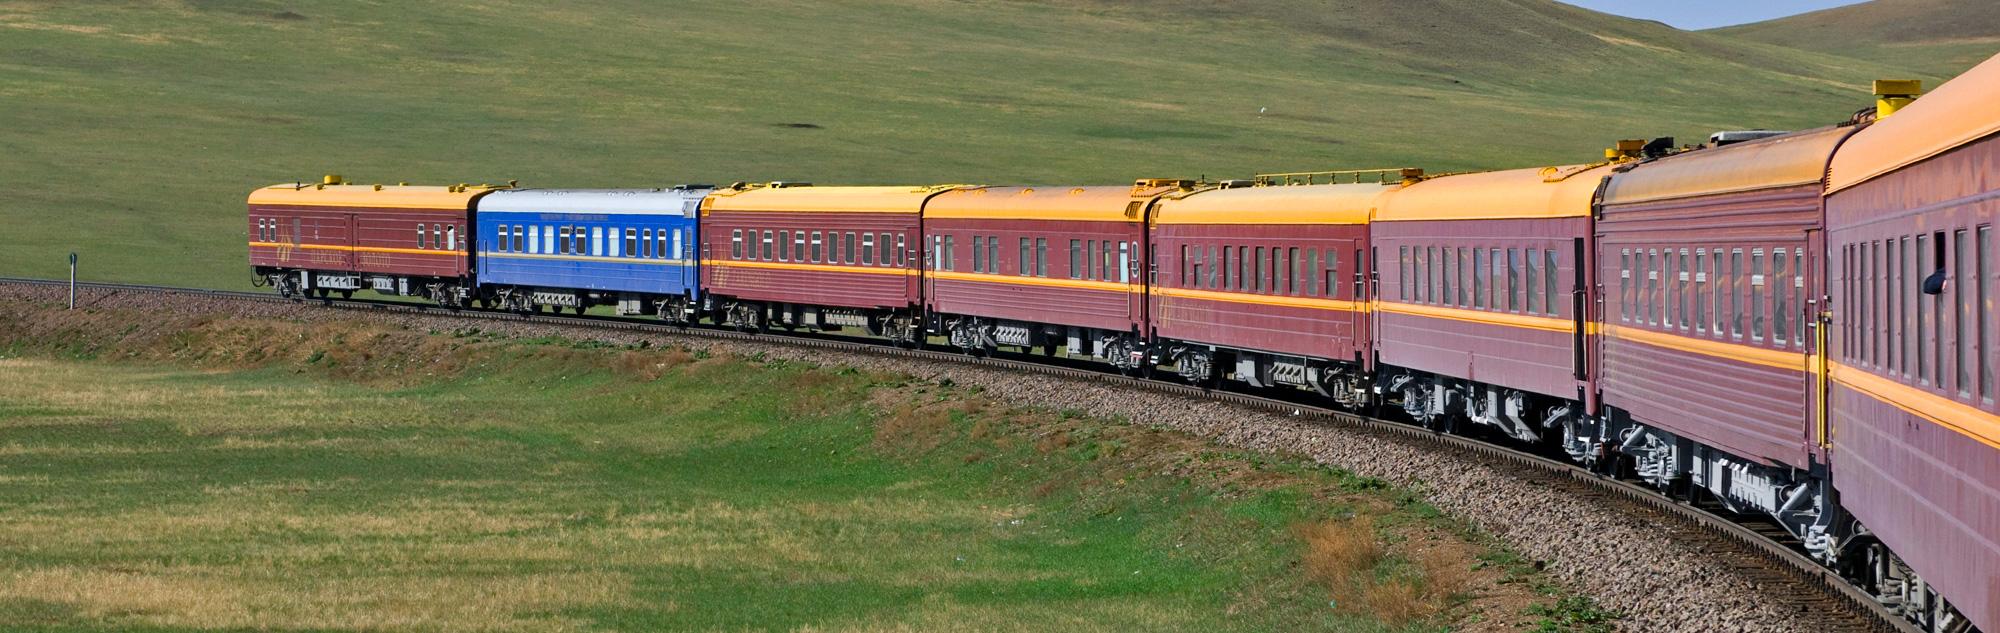 trannies on a train